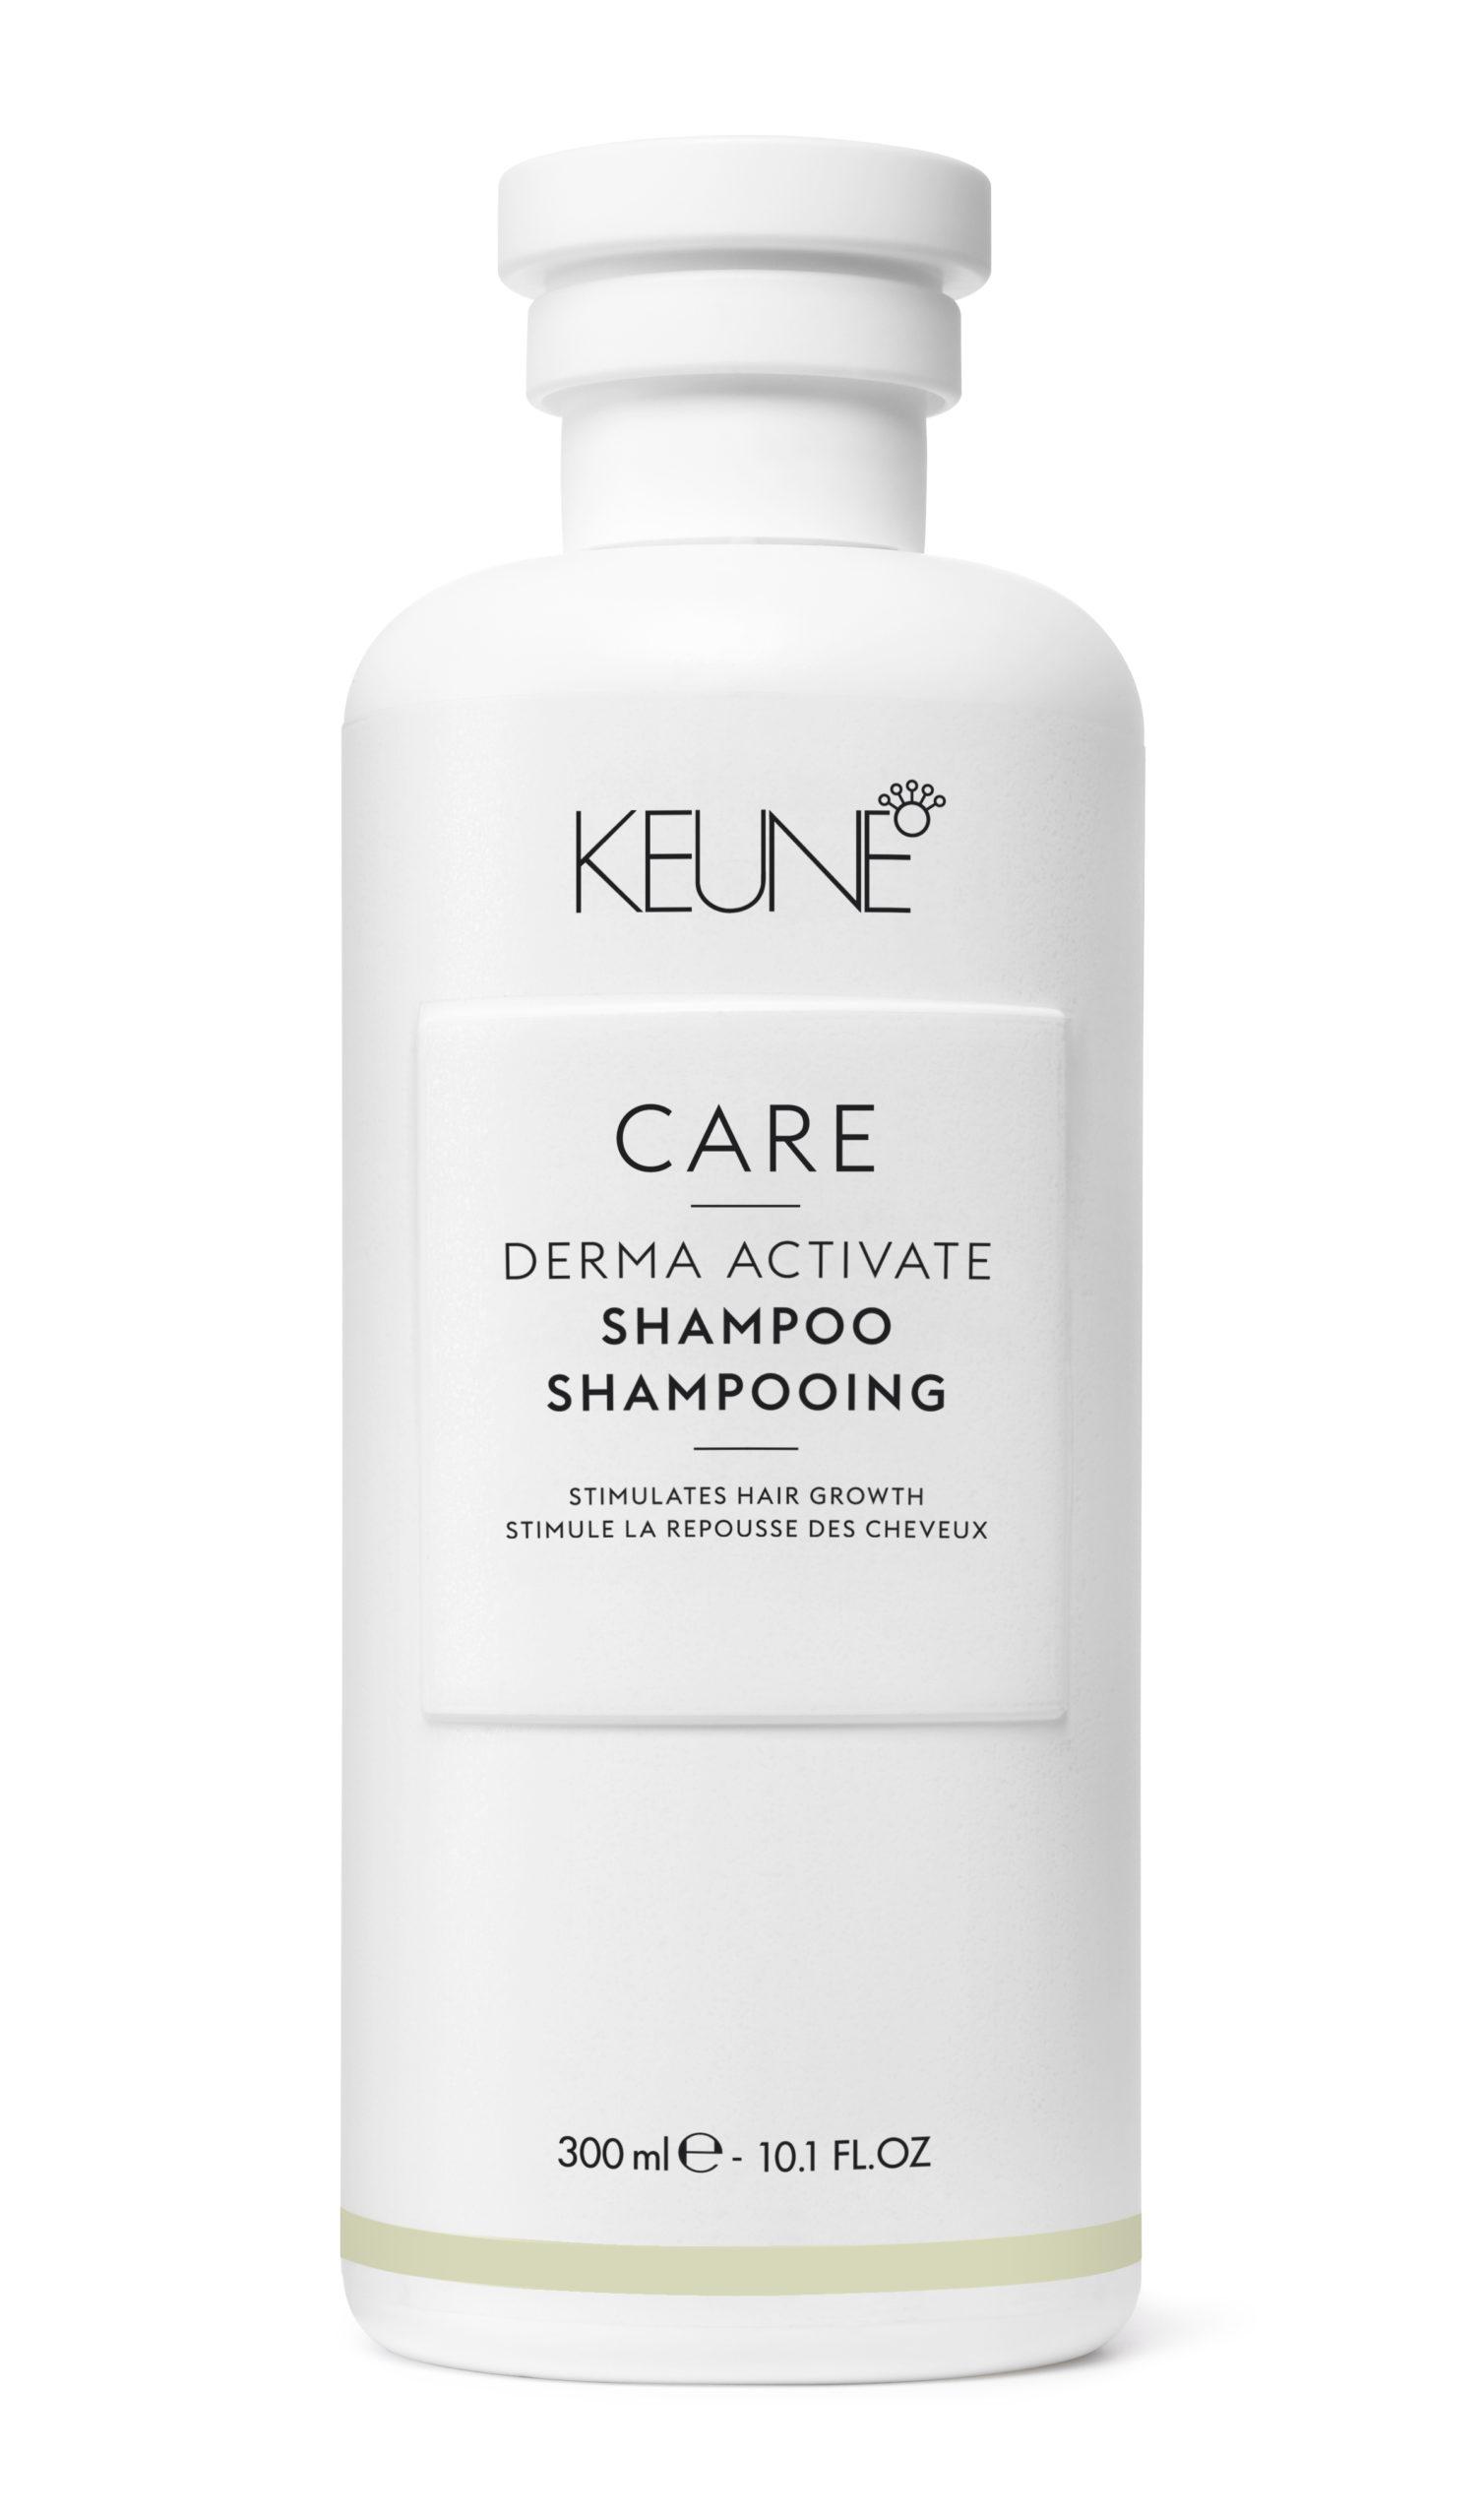 Care-Derma-Activate-Shampoo-300ml-highres